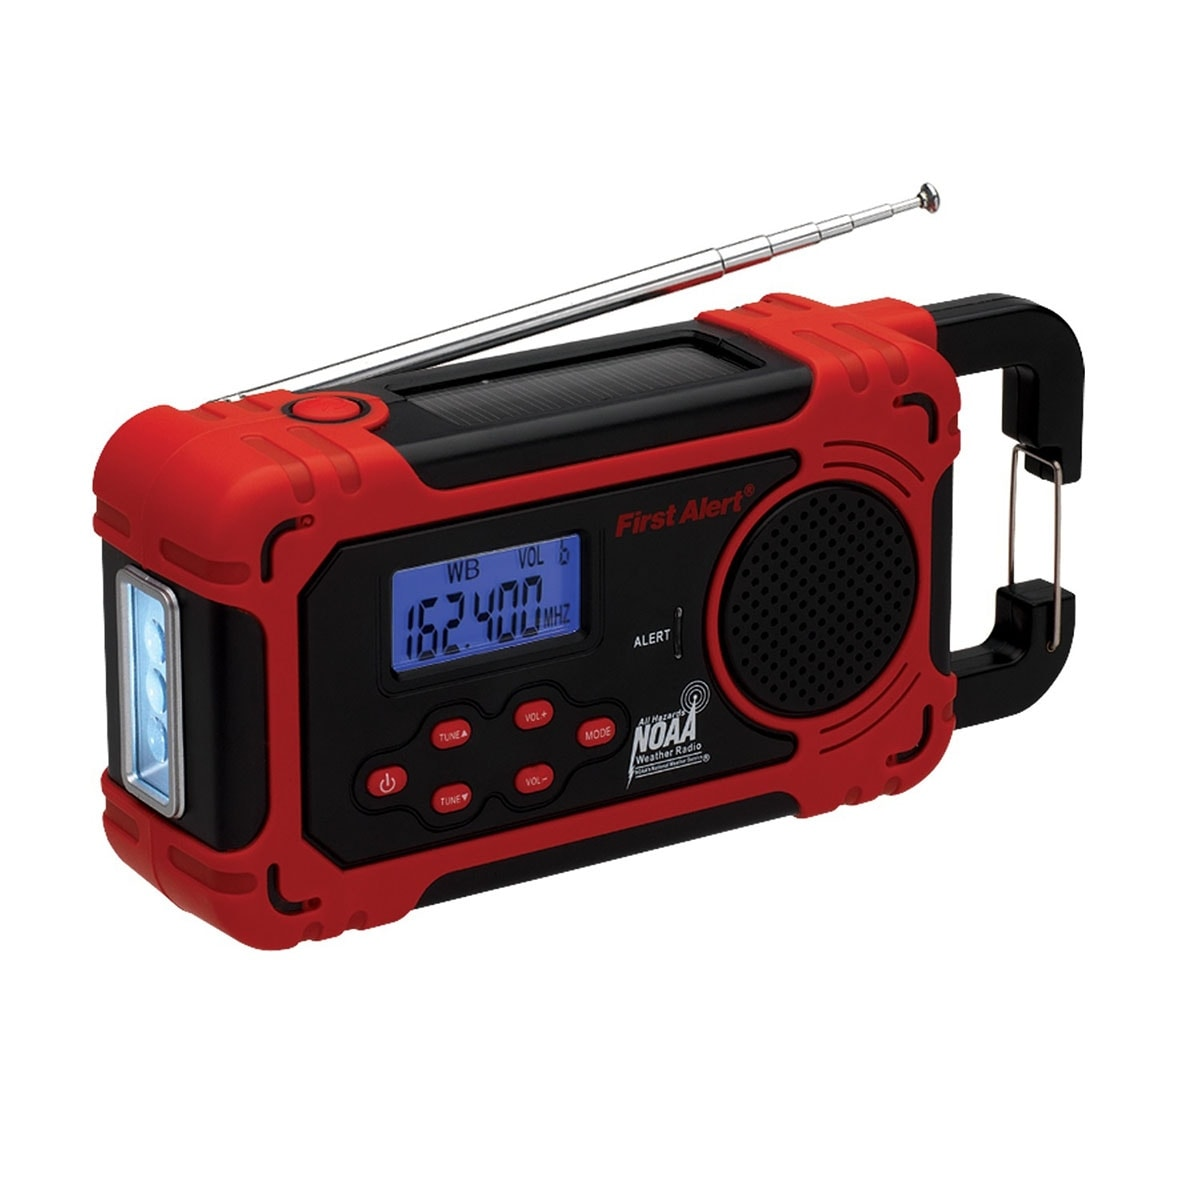 First Alert Spectra AM/FM Weather Band 4-Way Power Radio - FA1160